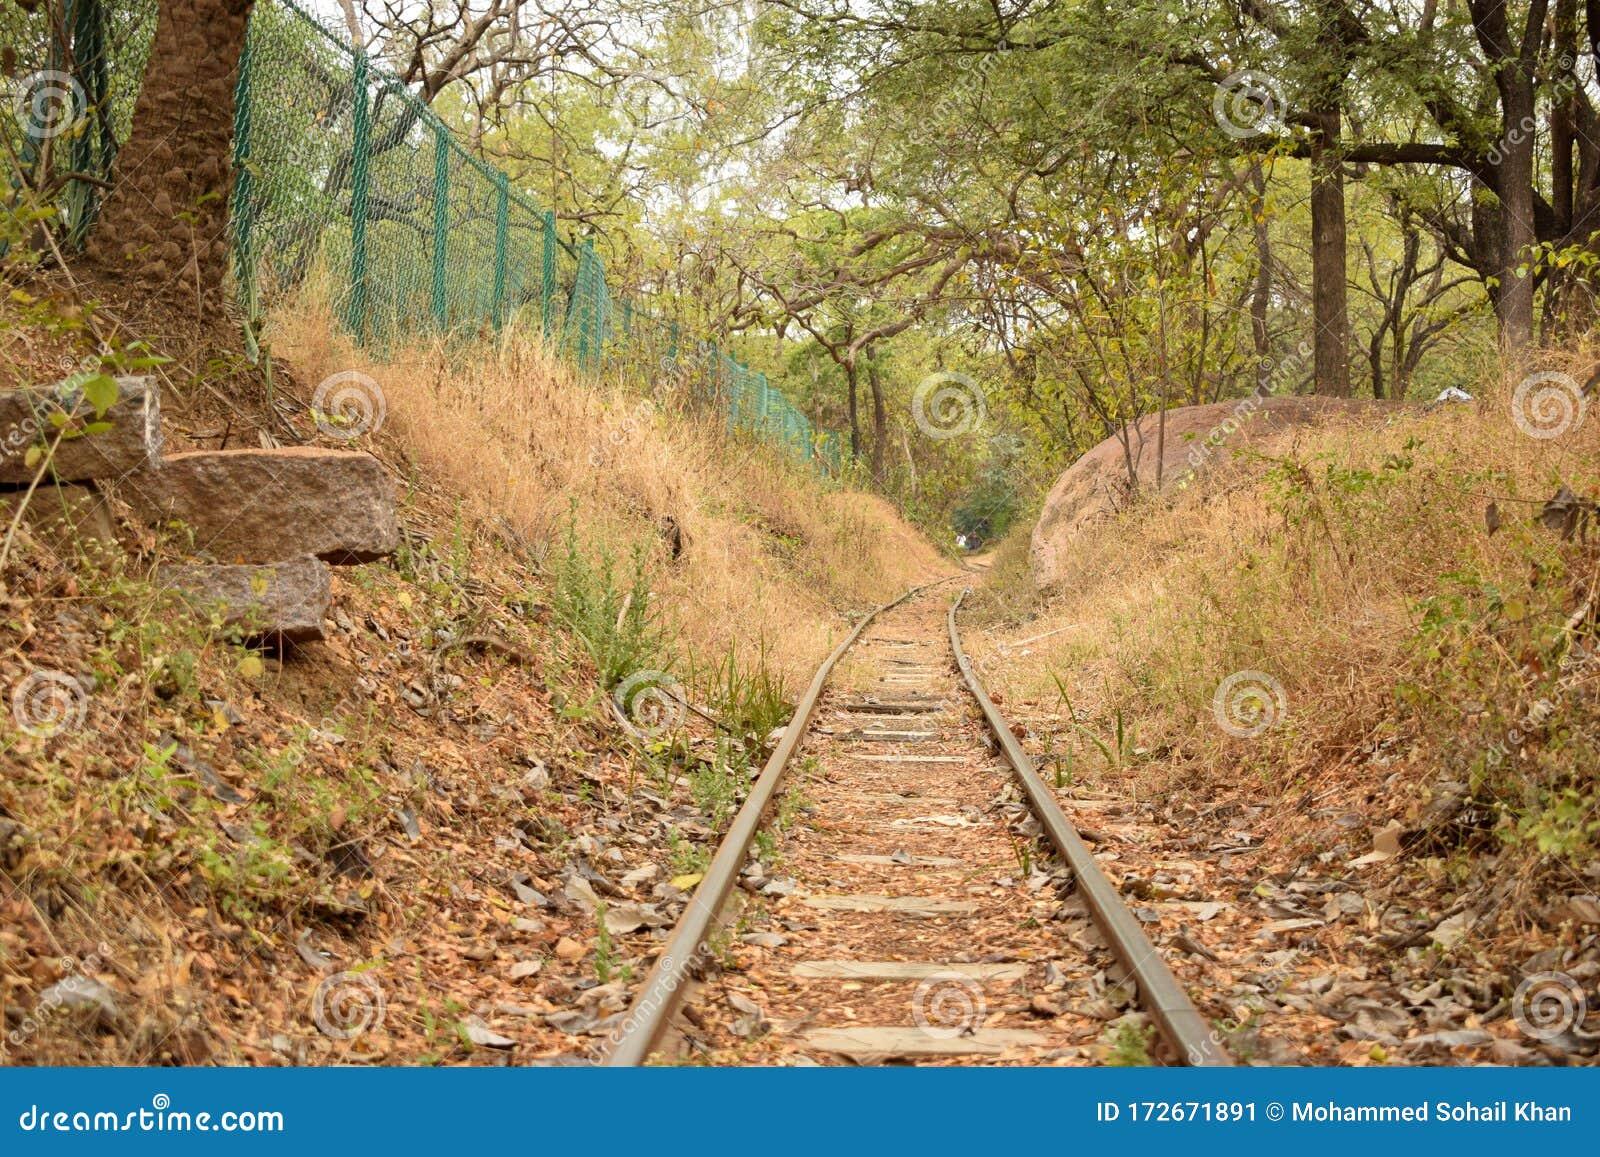 Abandoned Railroad Tracks stock image. Image of season